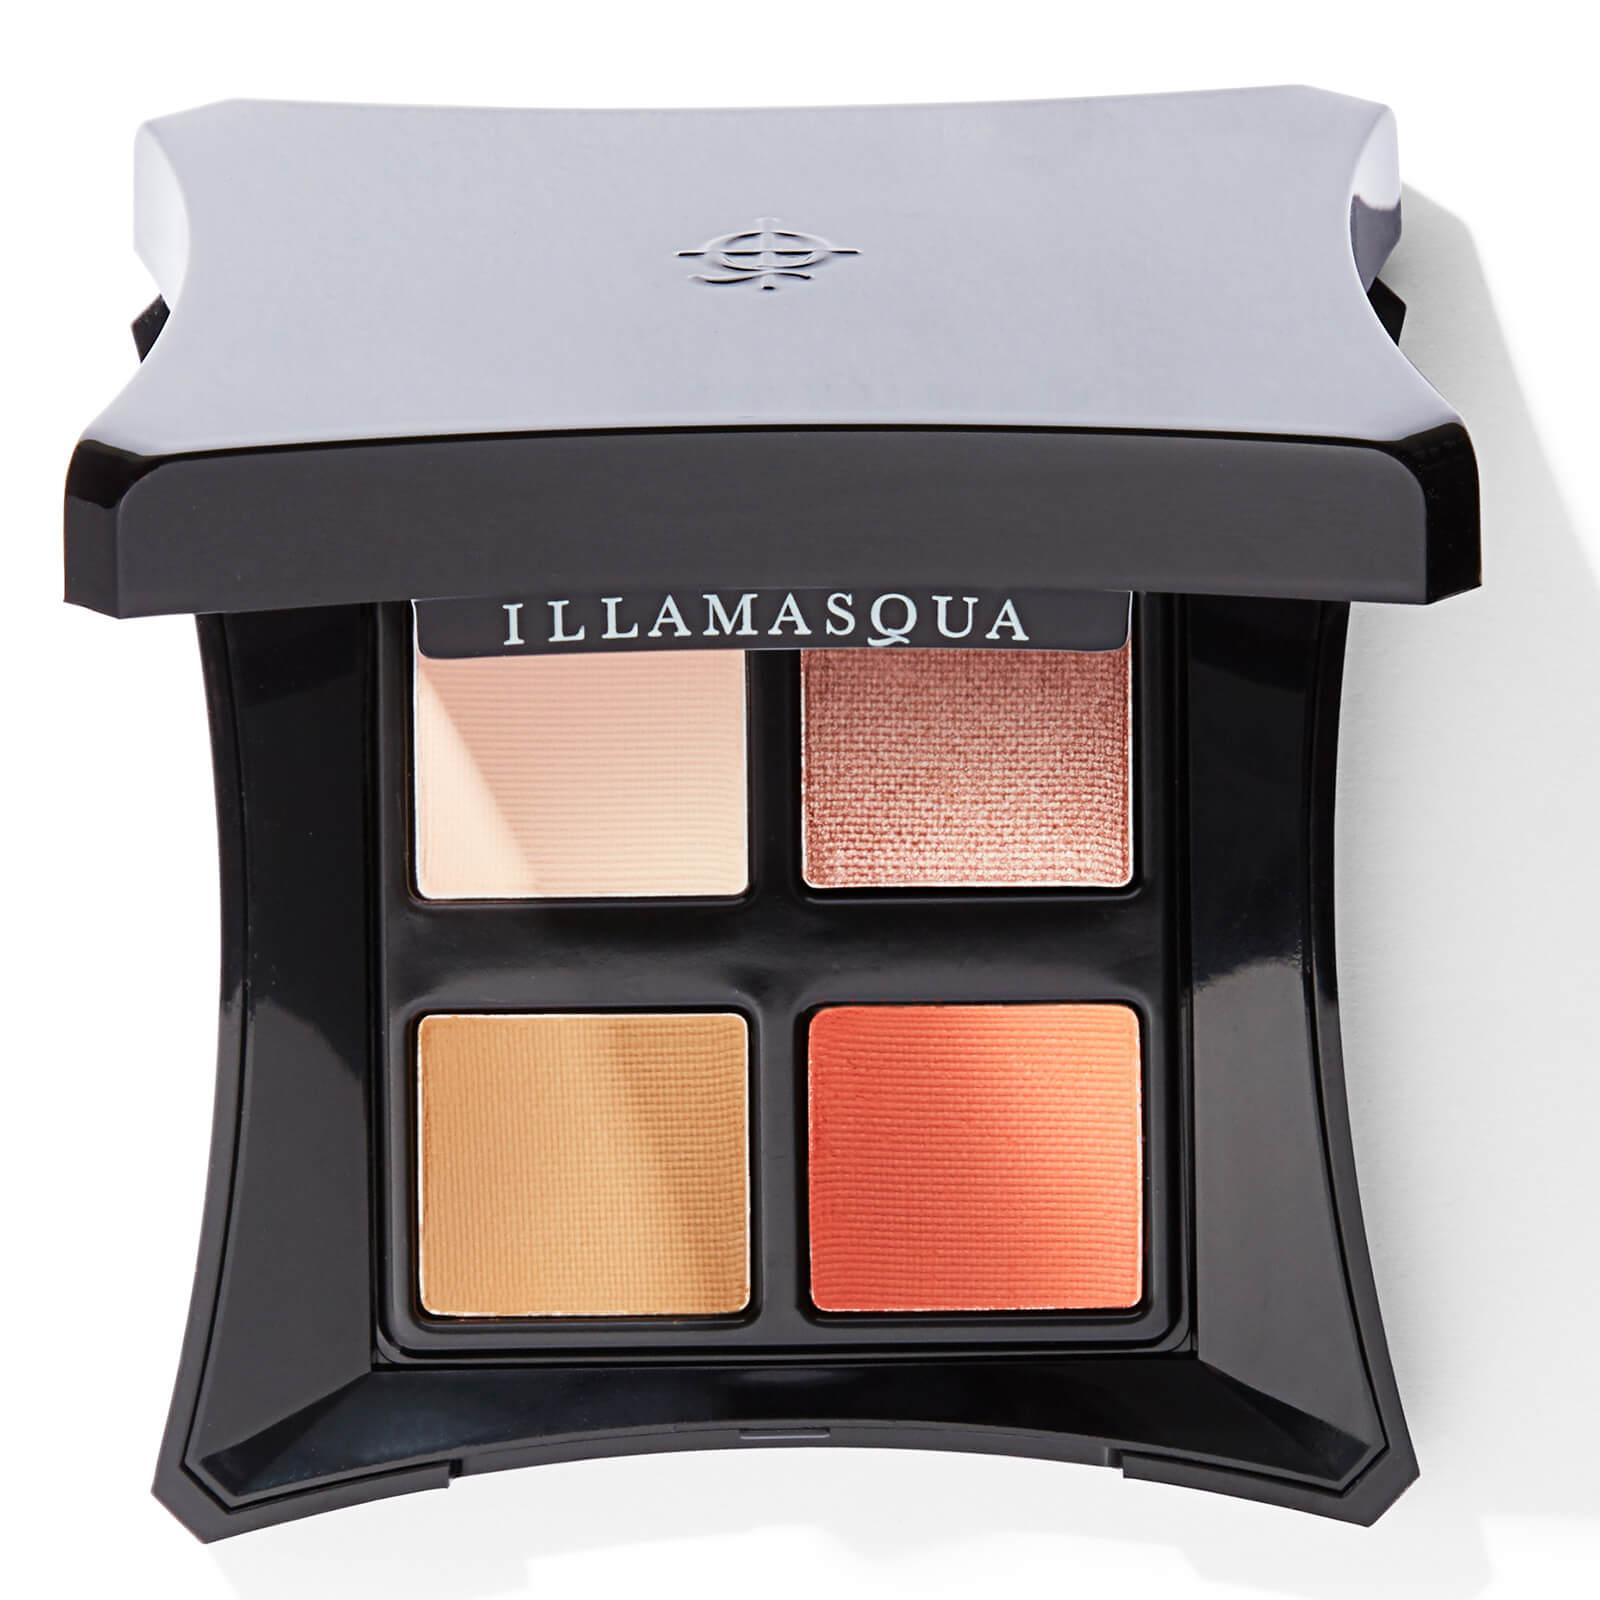 05f4b1cb771 Illamasqua Quad Palette   Free Shipping   Lookfantastic